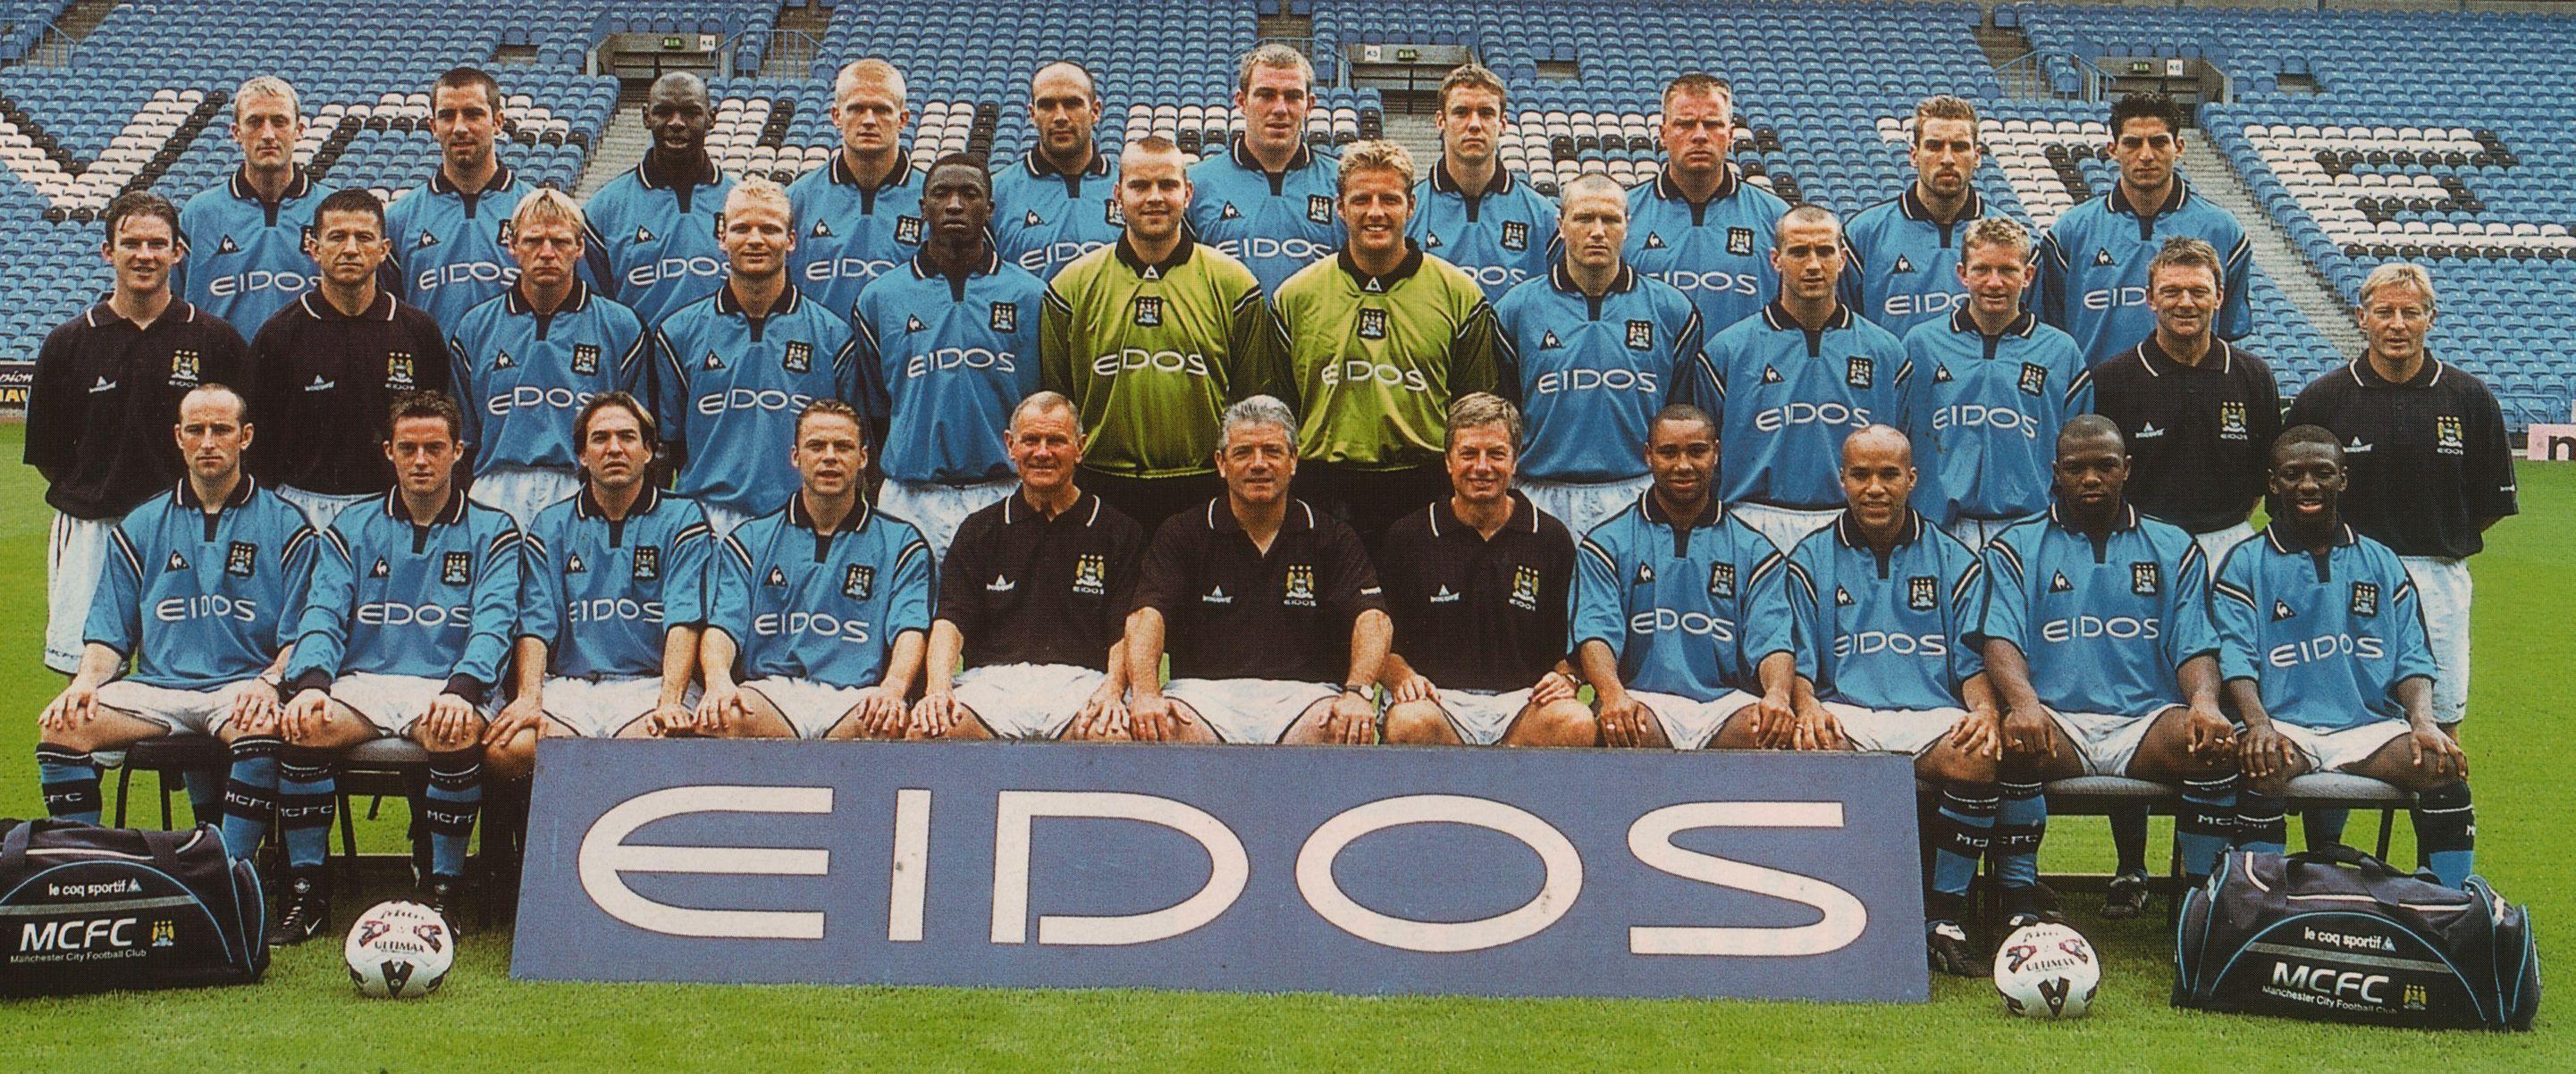 team-photo-2001-to-02.jpg